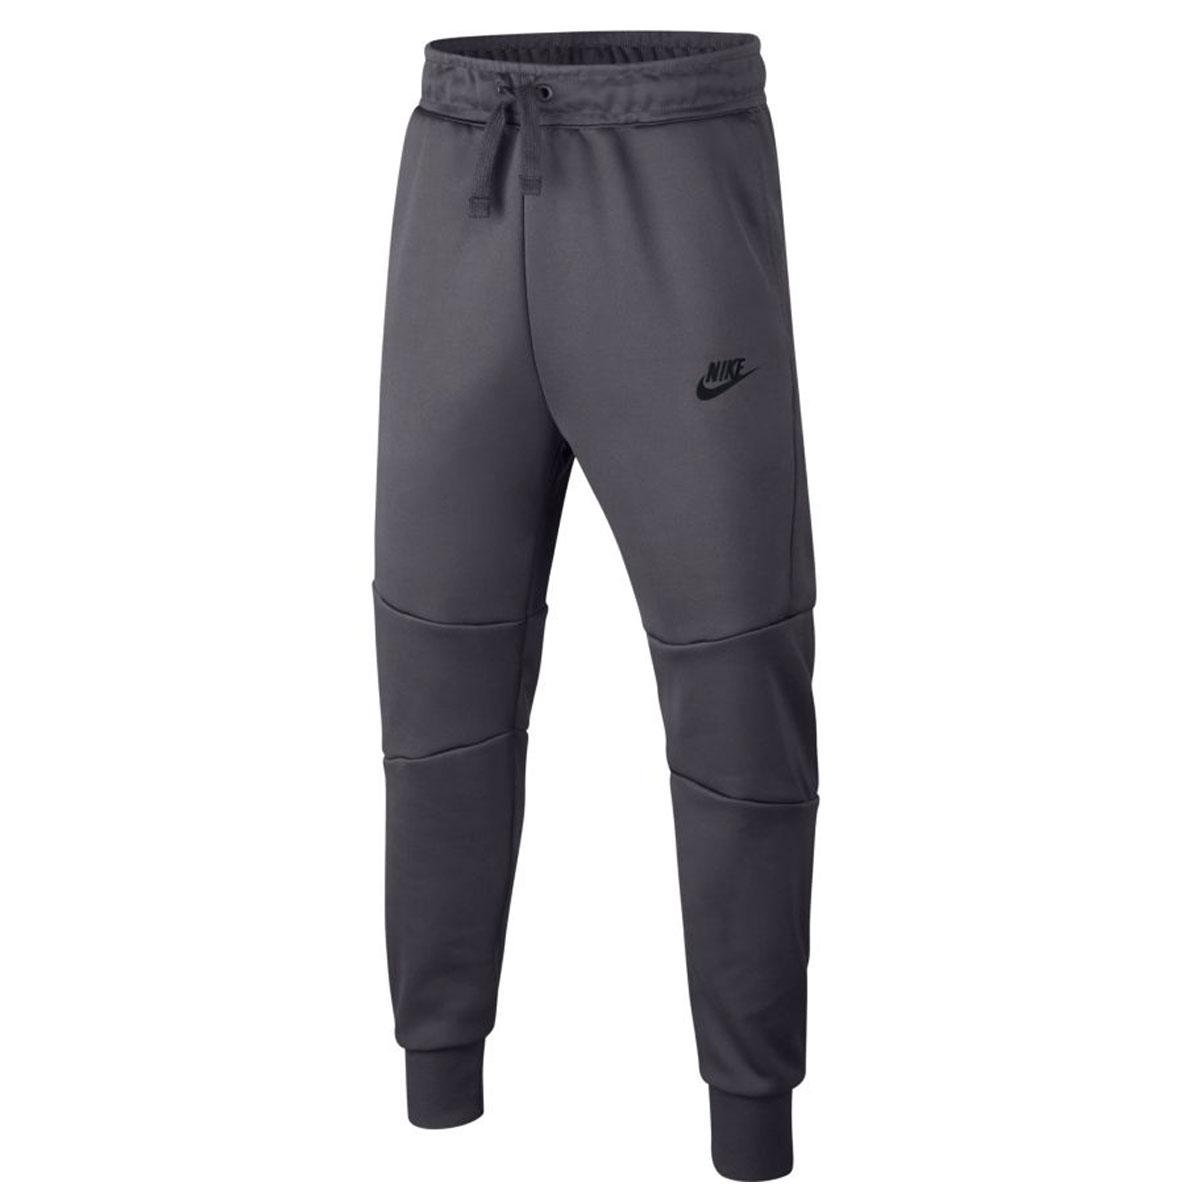 36324122030 Nike Tech Pack SSNL Trainingsbroek GRIJS online kopen bij Sportpaleis.